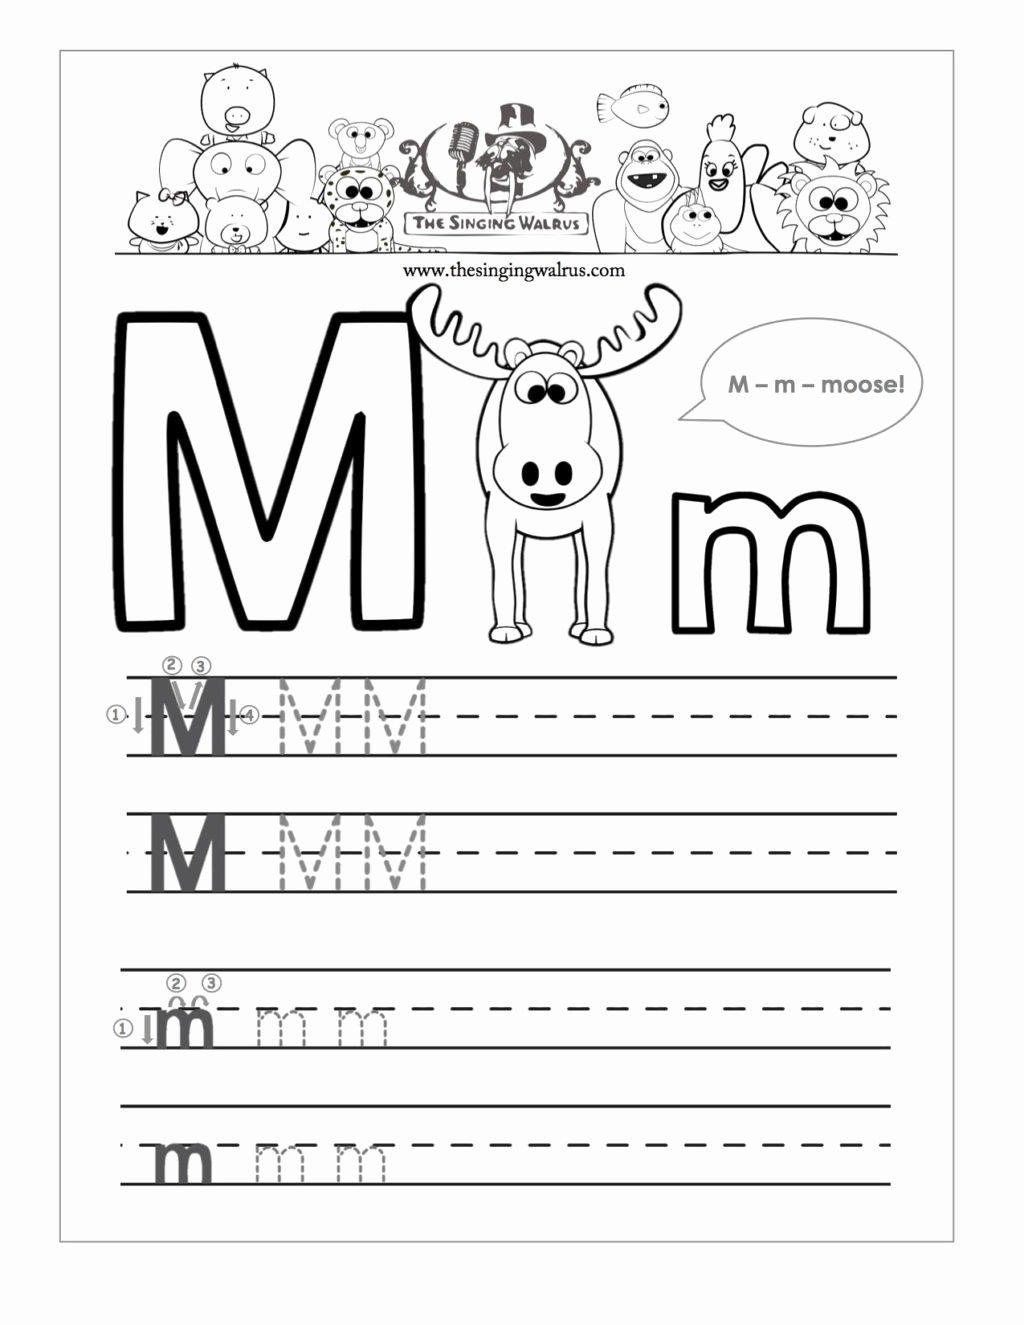 Worksheets for Preschoolers Letter M top Worksheet Worksheet Writing Practice for Kindergarten